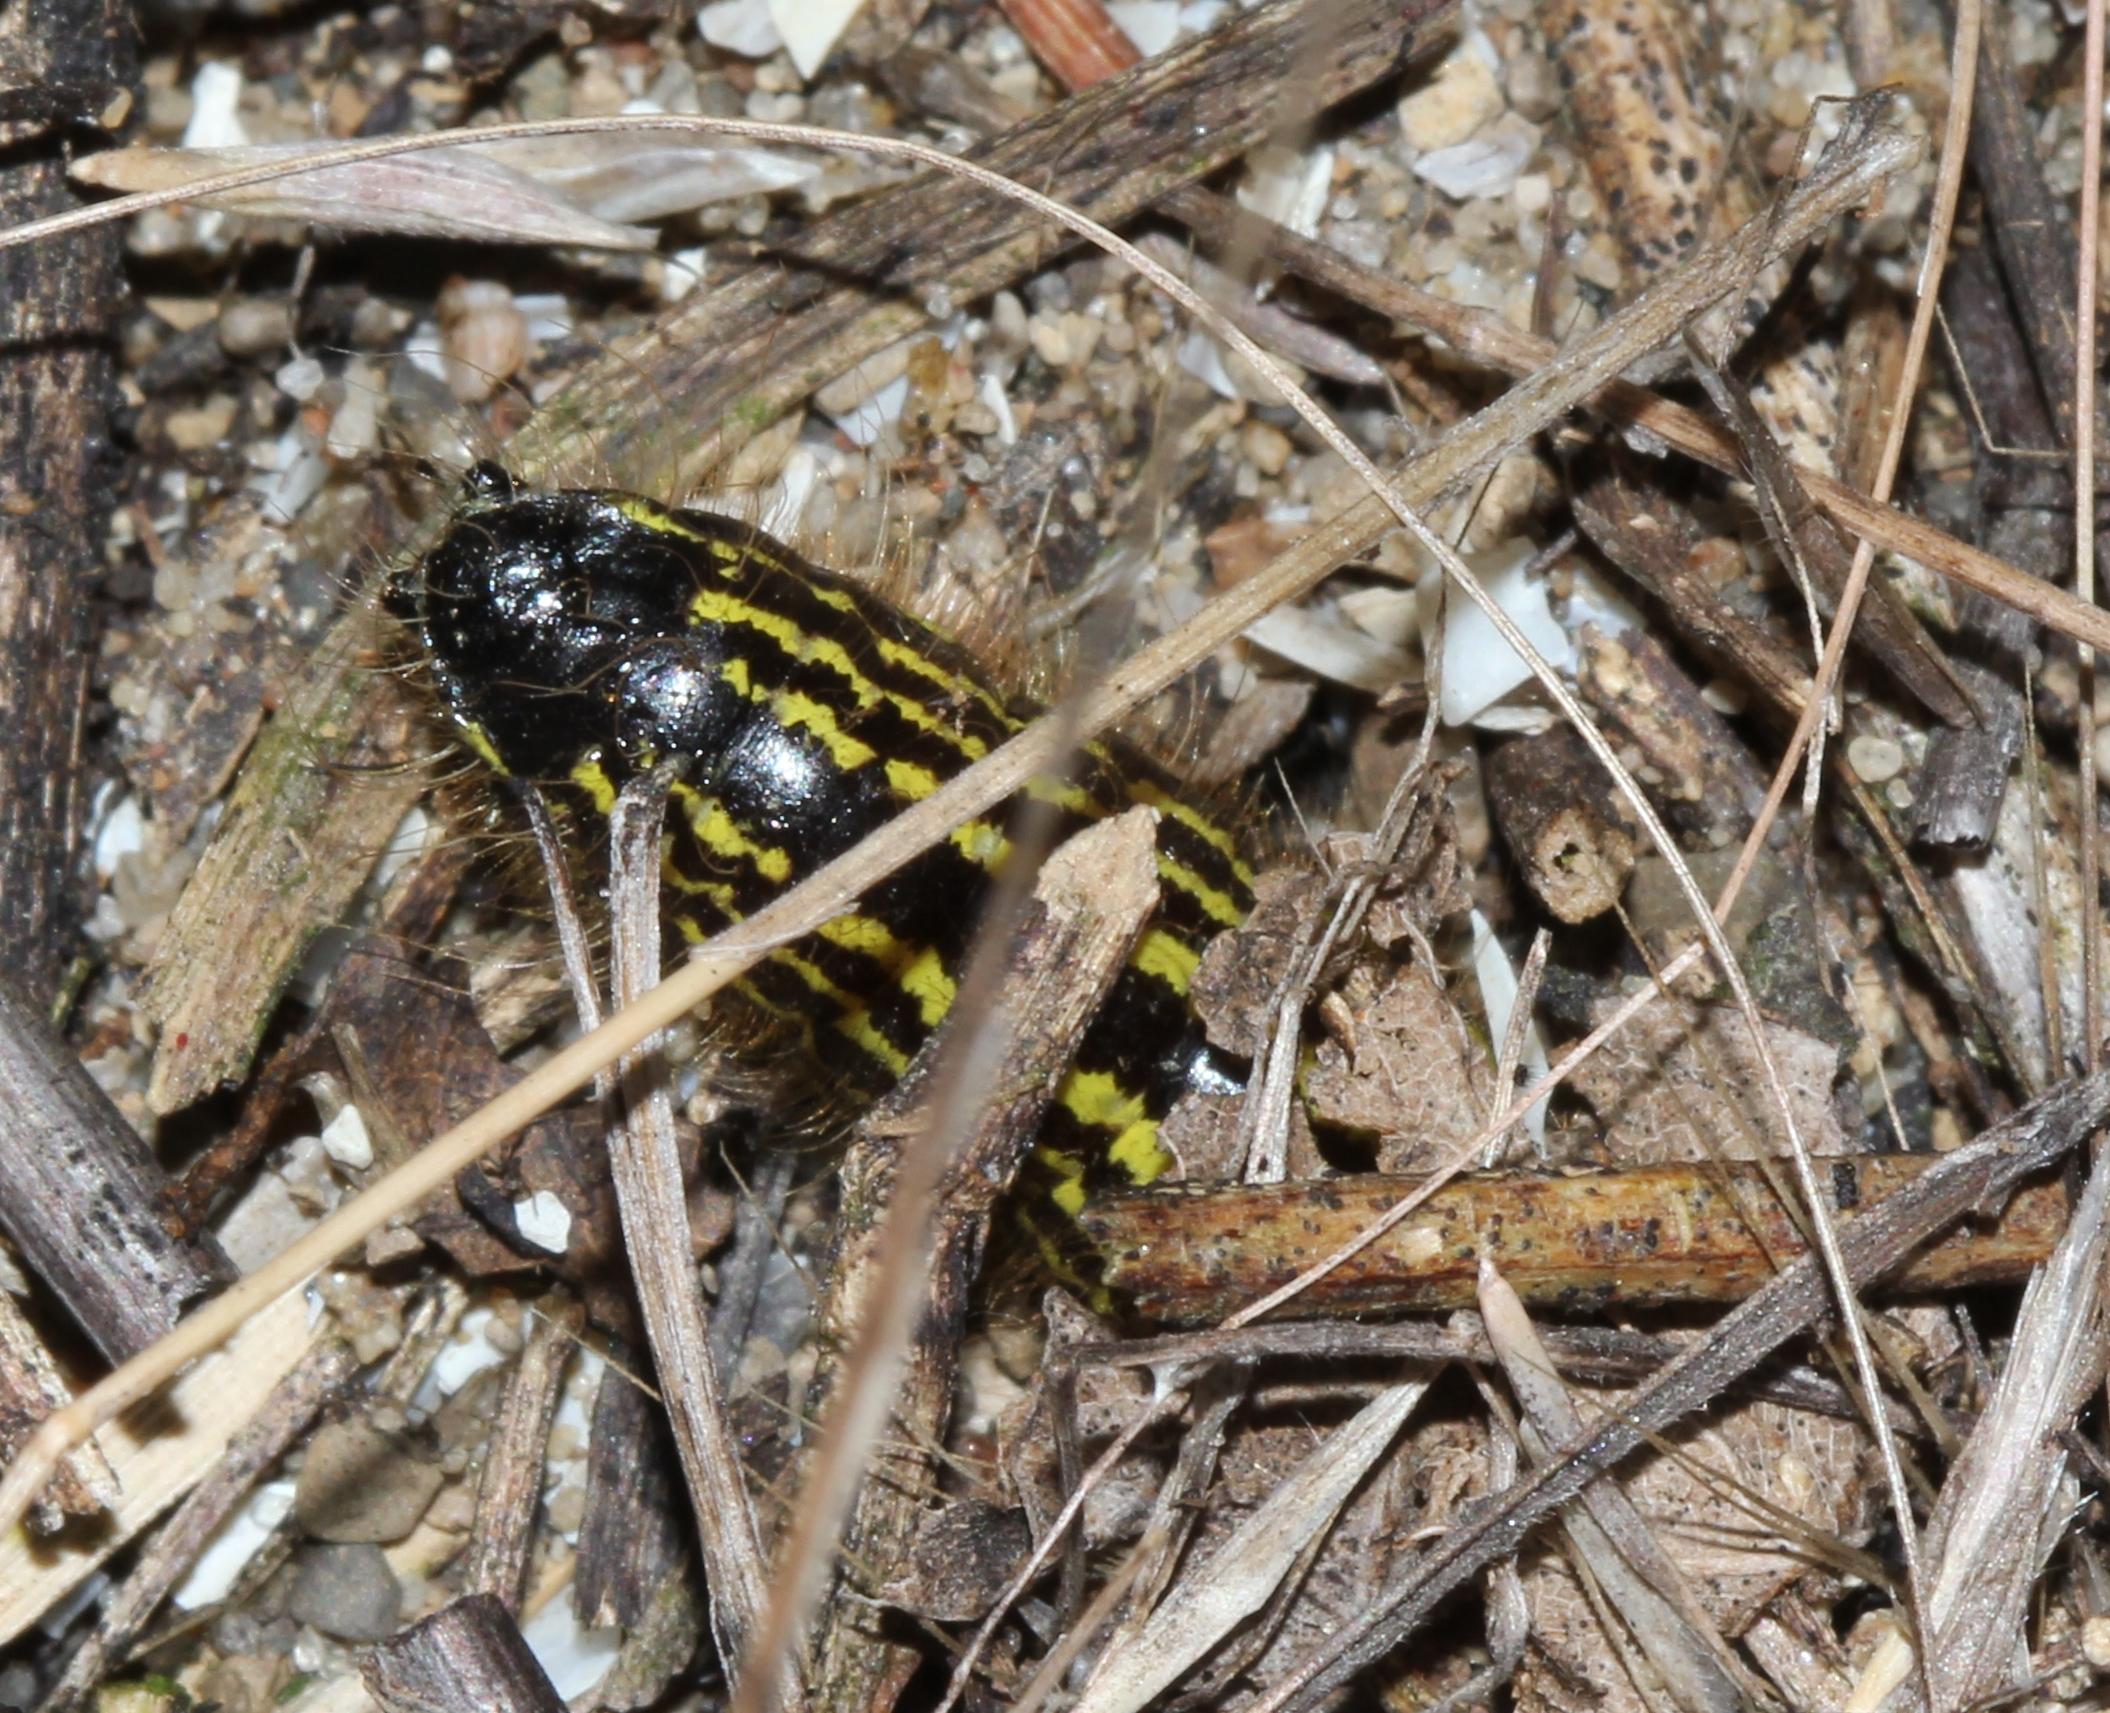 Spotted Datana caterpillar burrowing underground to pupate (2)